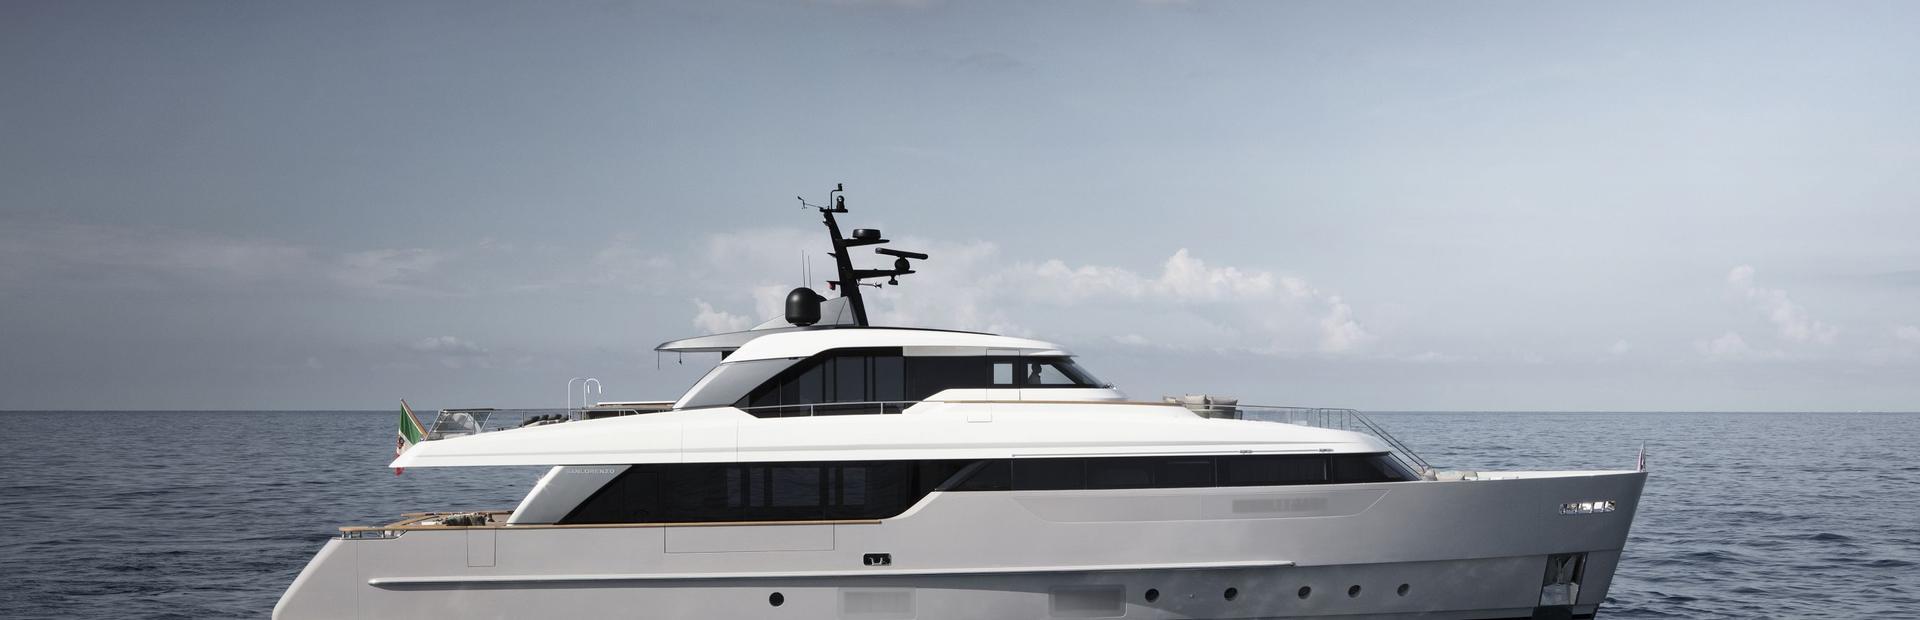 SD96 Yacht Charter